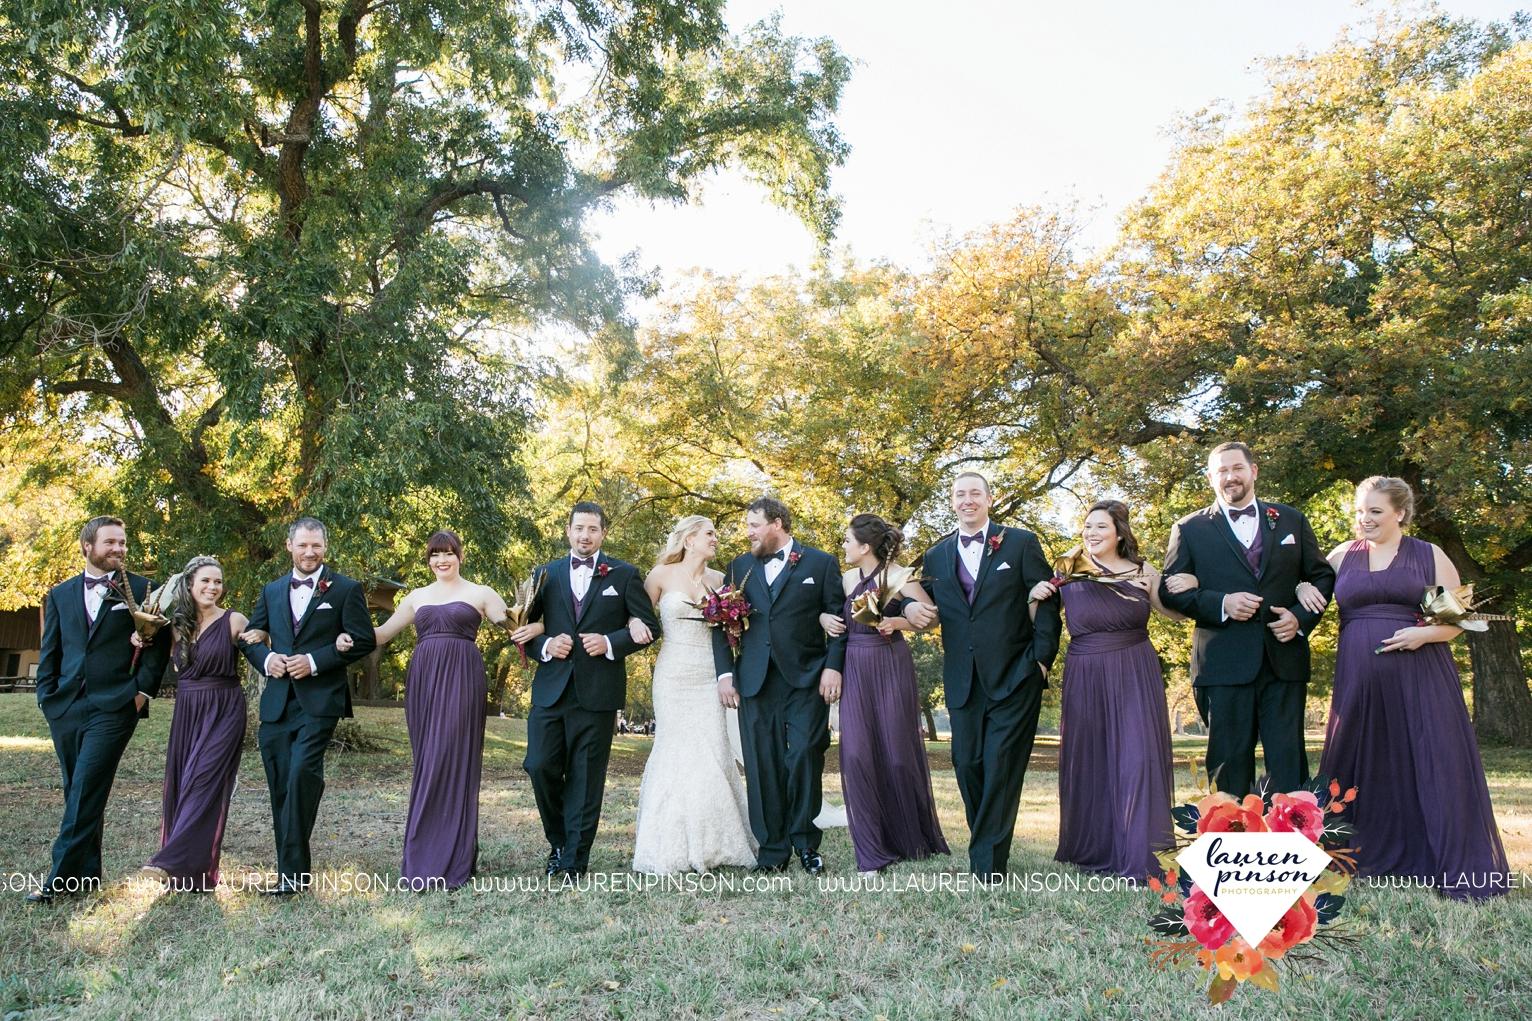 rustic-wichita-falls-texas-wedding-photographer-gold-glam-mayfield-events-market-street-united-allue-bridals-fall_1750.jpg